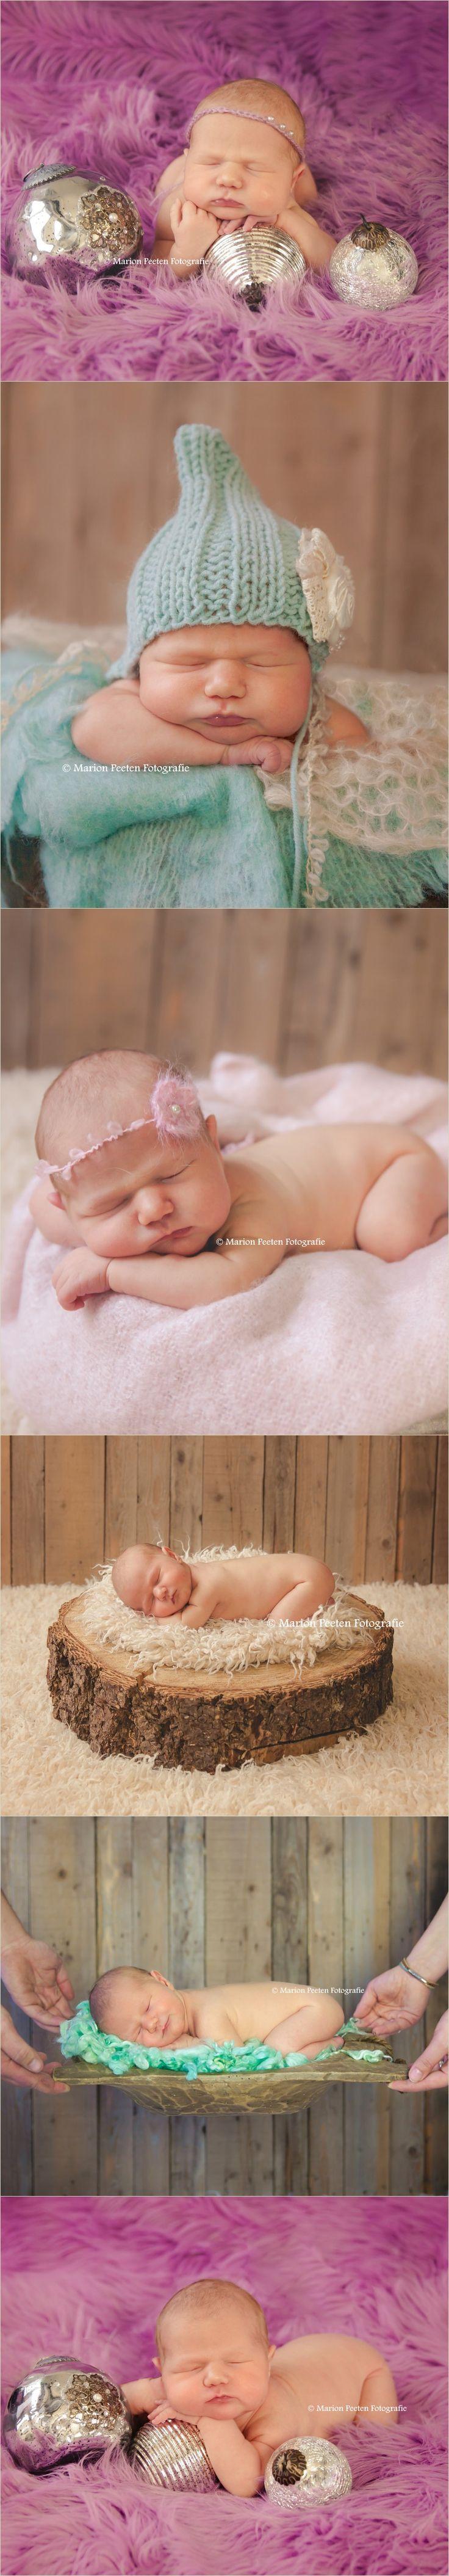 Newborn photography in studio Newborn fotografie in de studio. Newborn christmas picture. Newborn kerst foto